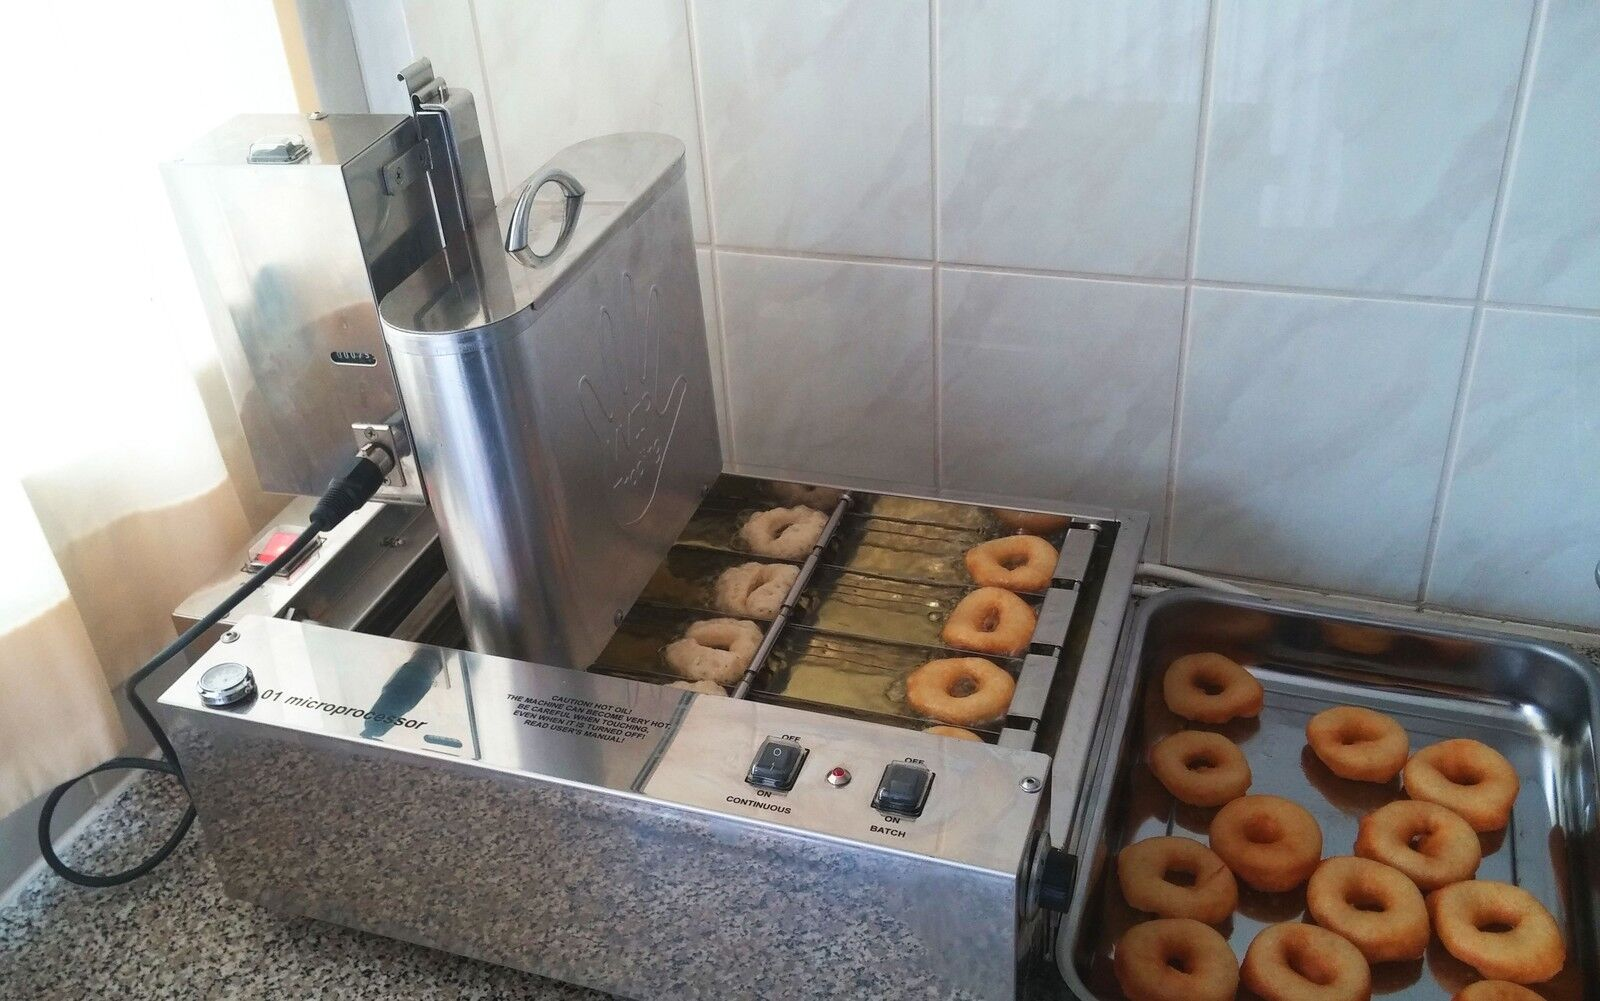 1150 donuts p s vollautomatische profi mini donut maschine donutmaker eu eur. Black Bedroom Furniture Sets. Home Design Ideas